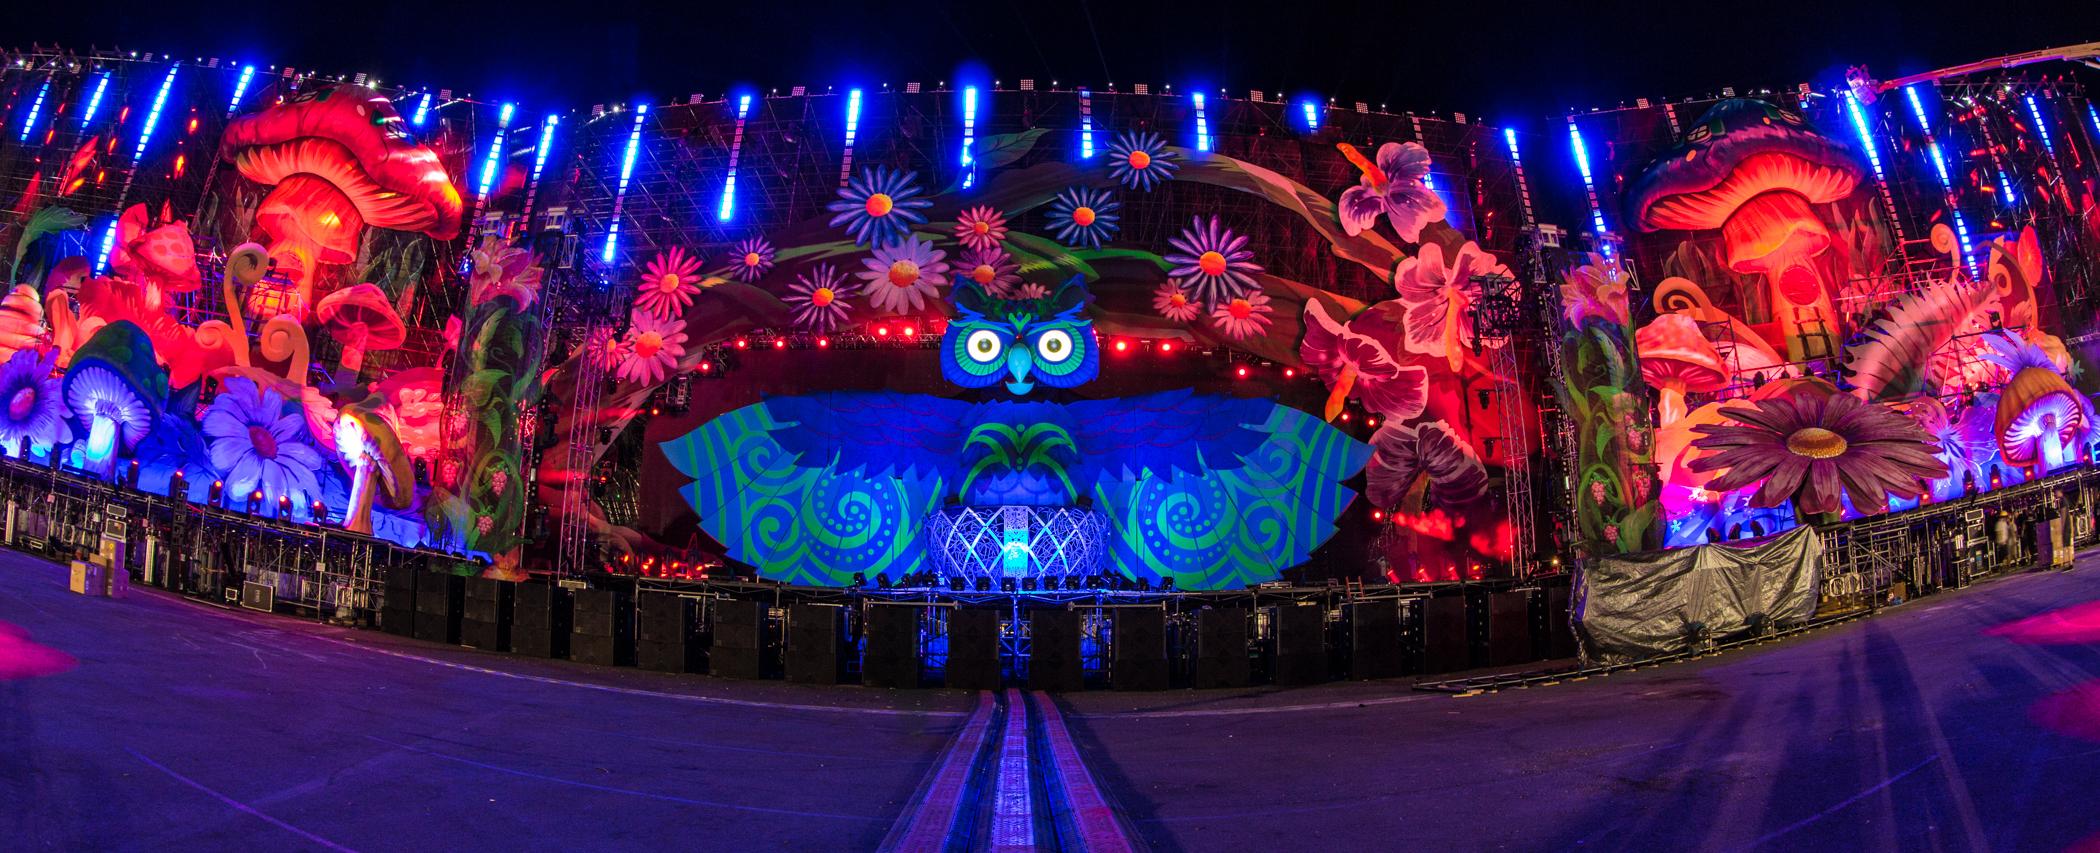 electric daisy carnival wallpaper wwwpixsharkcom